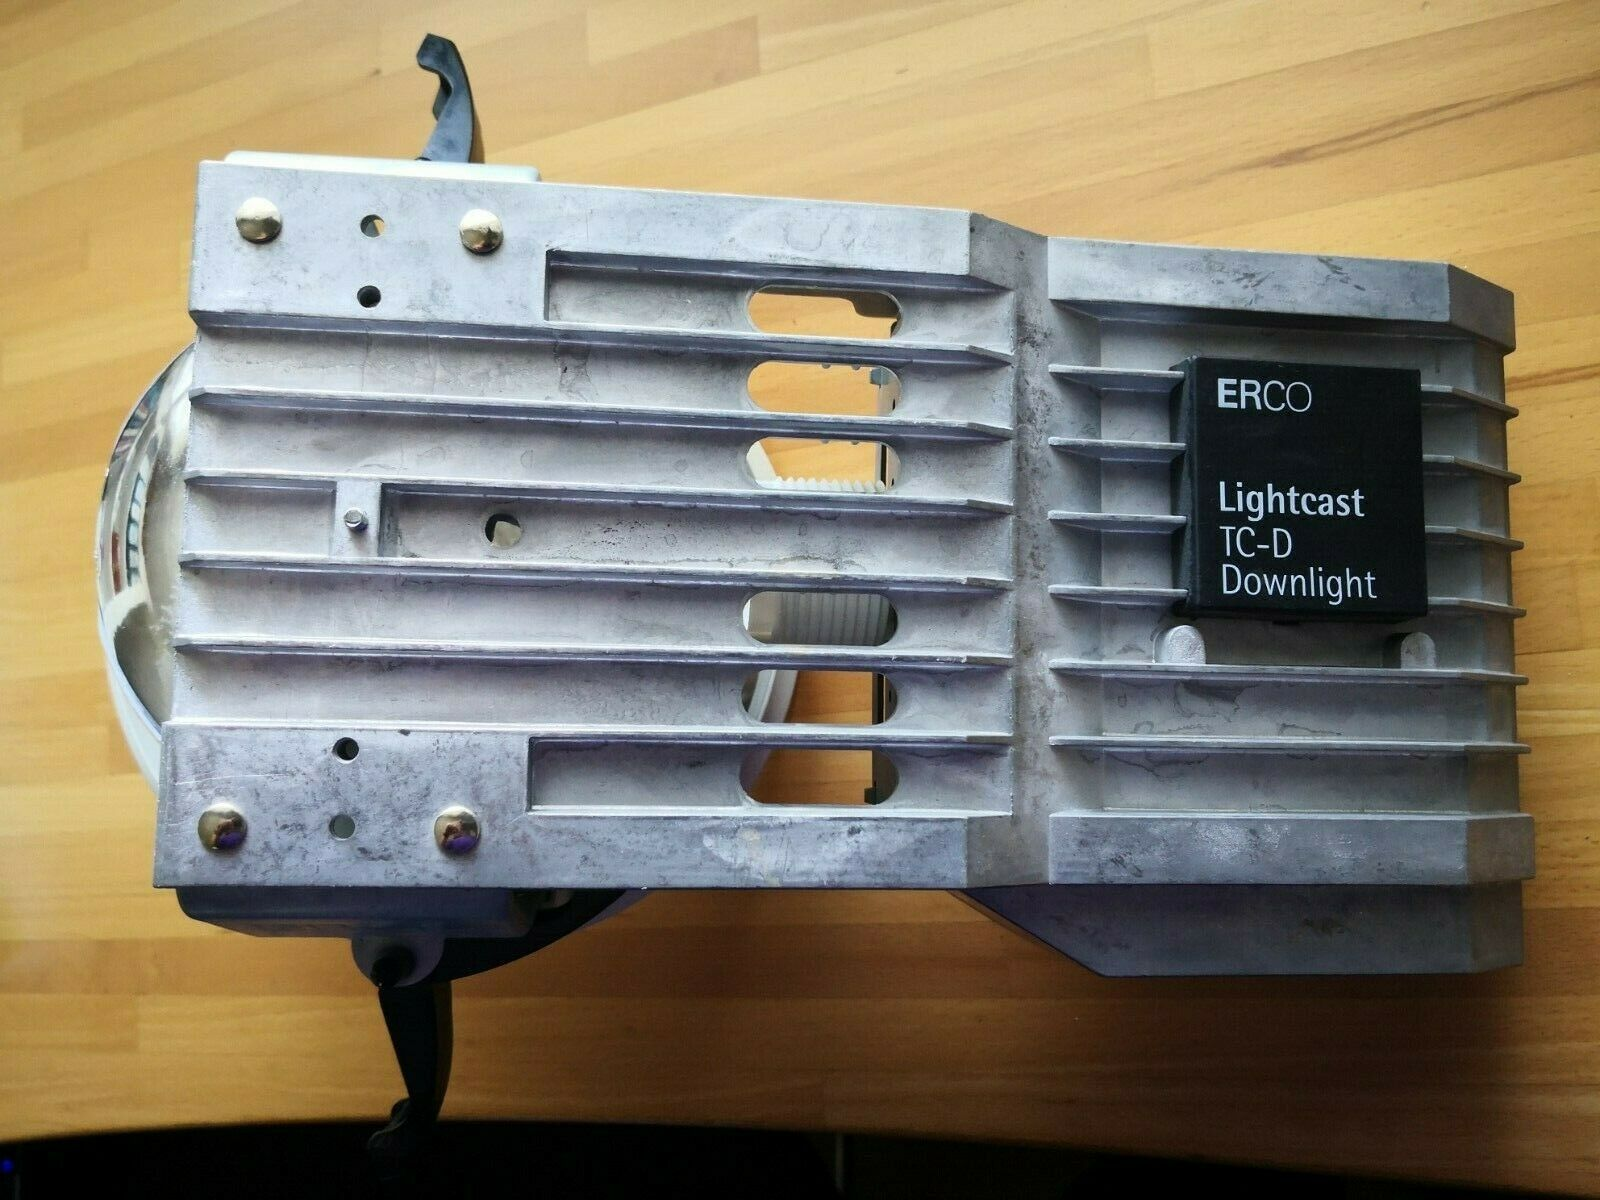 ERCO Downlight TC-D - 1x18W inkl. Leuchtmittel (EVG) (EVG) (EVG) 783f29